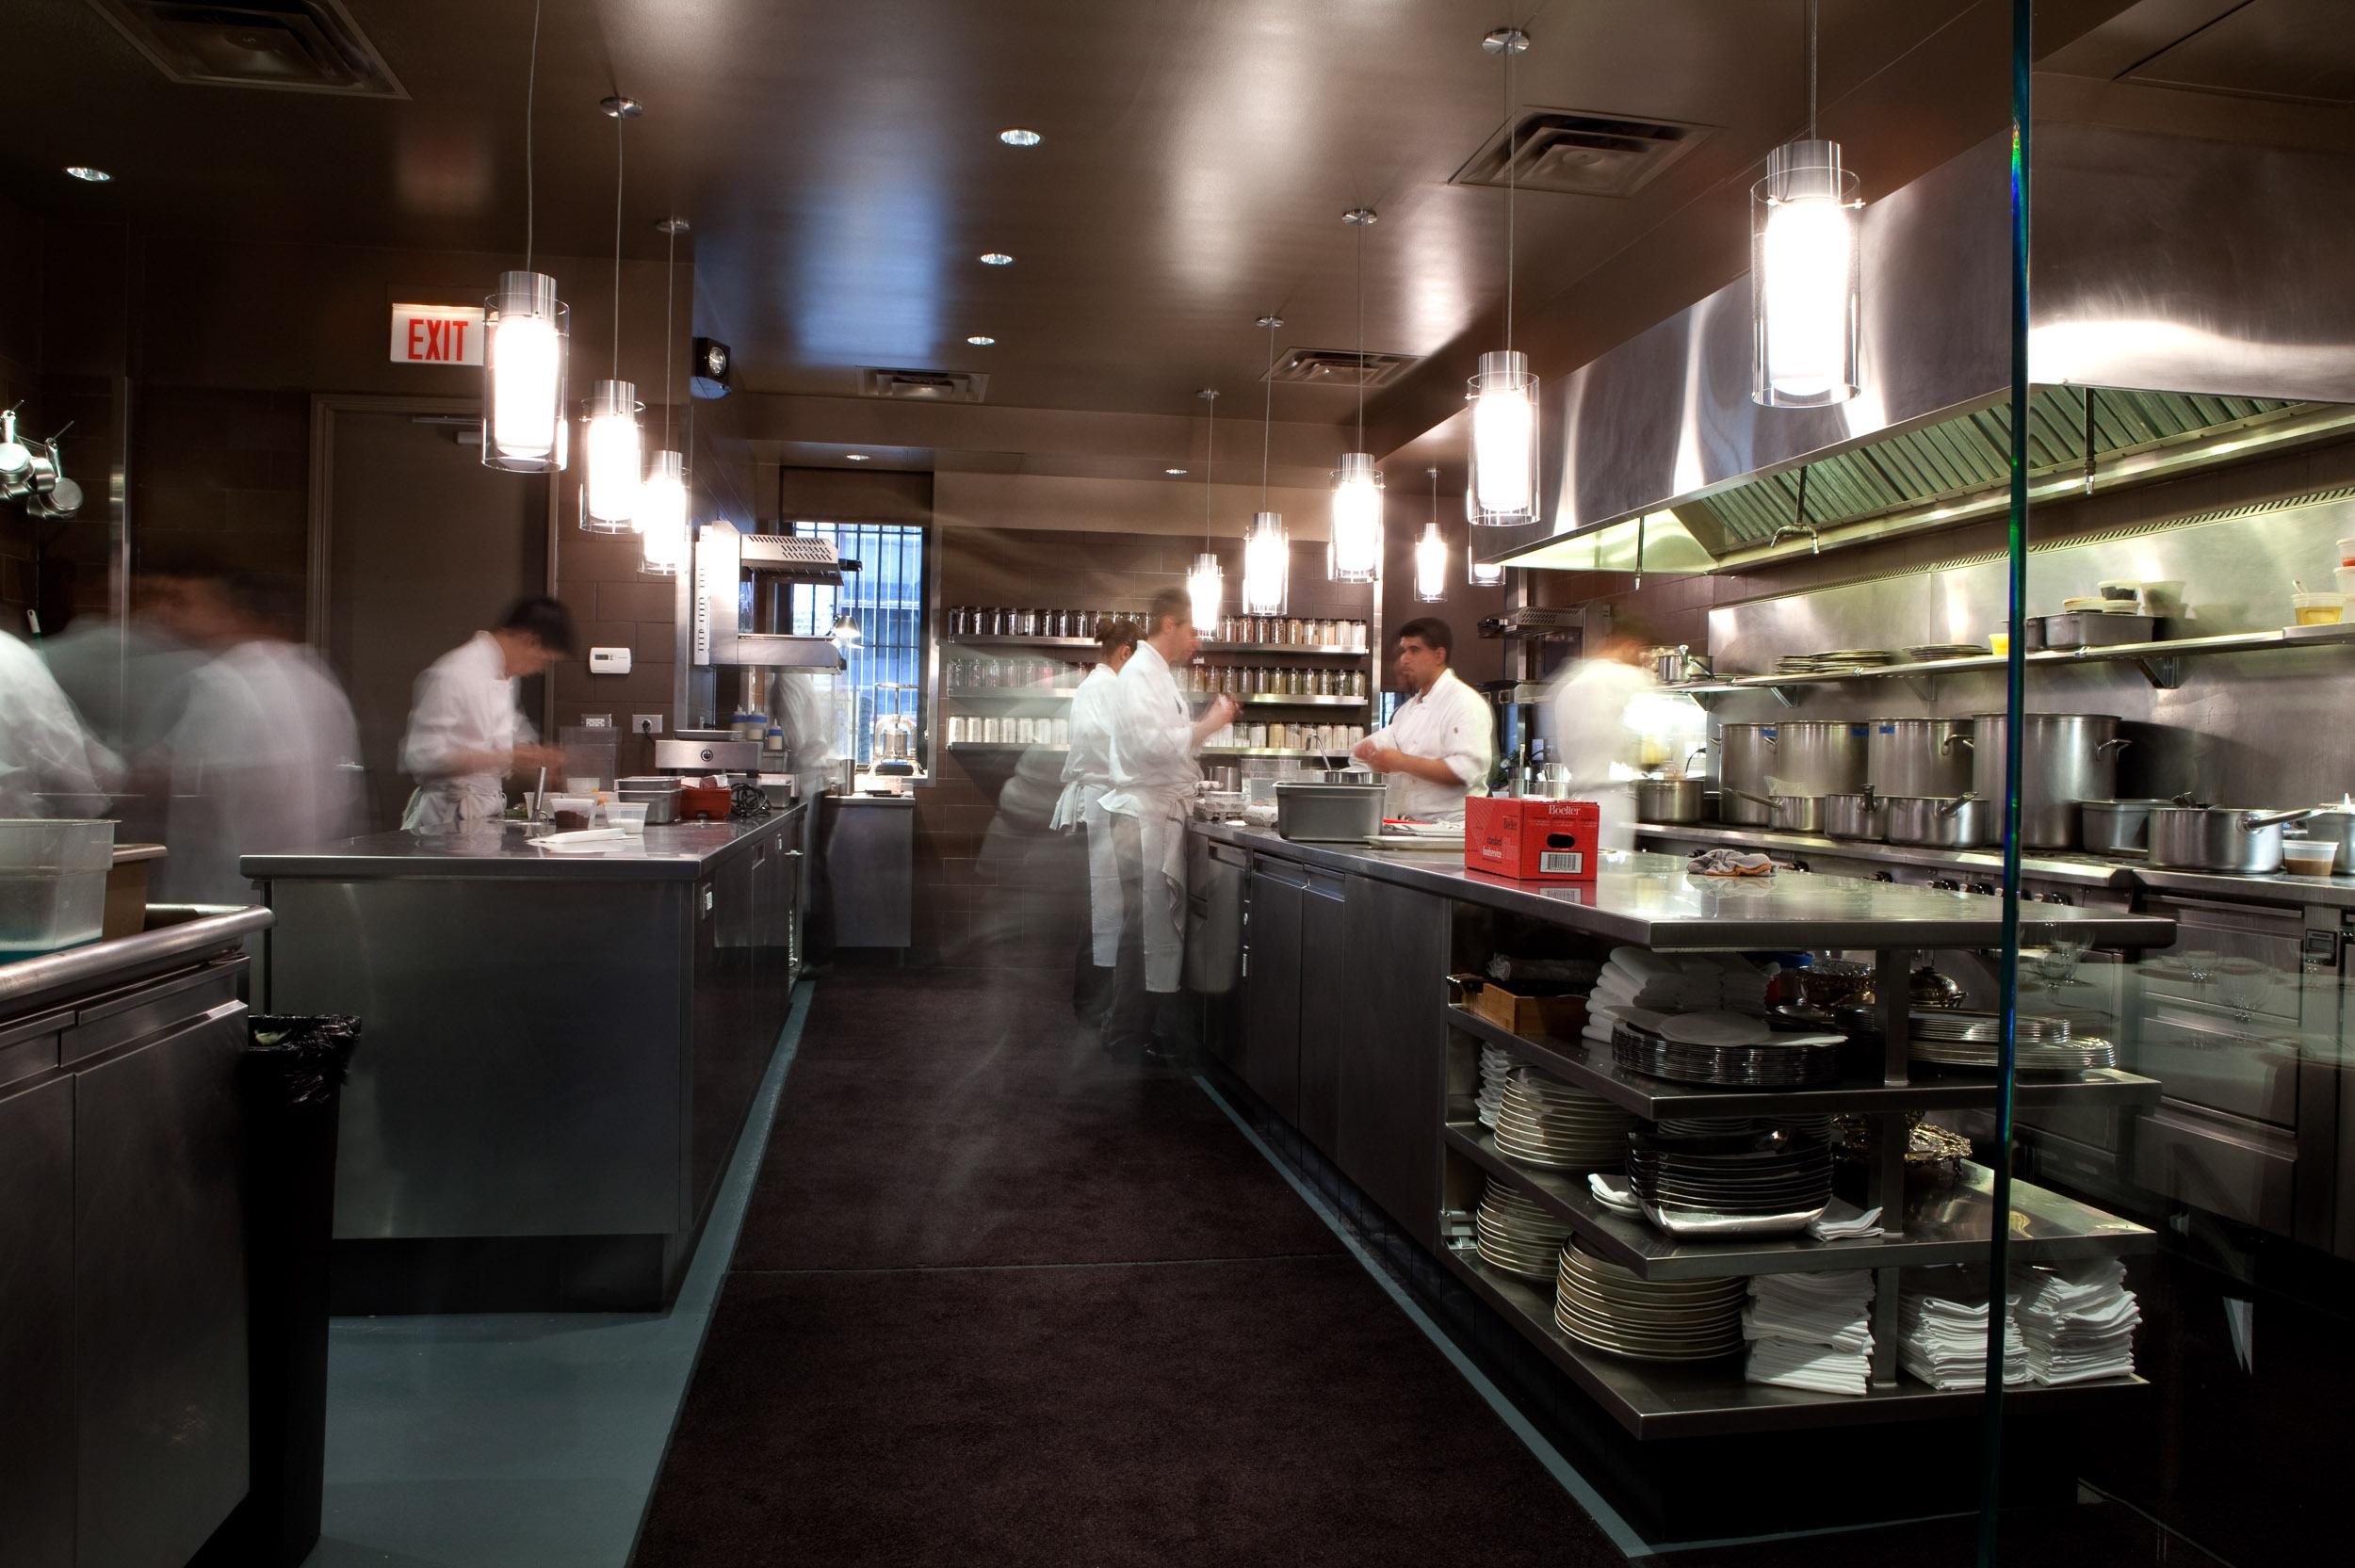 No More Reservations: Exclusive Restaurants Require Tickets Instead